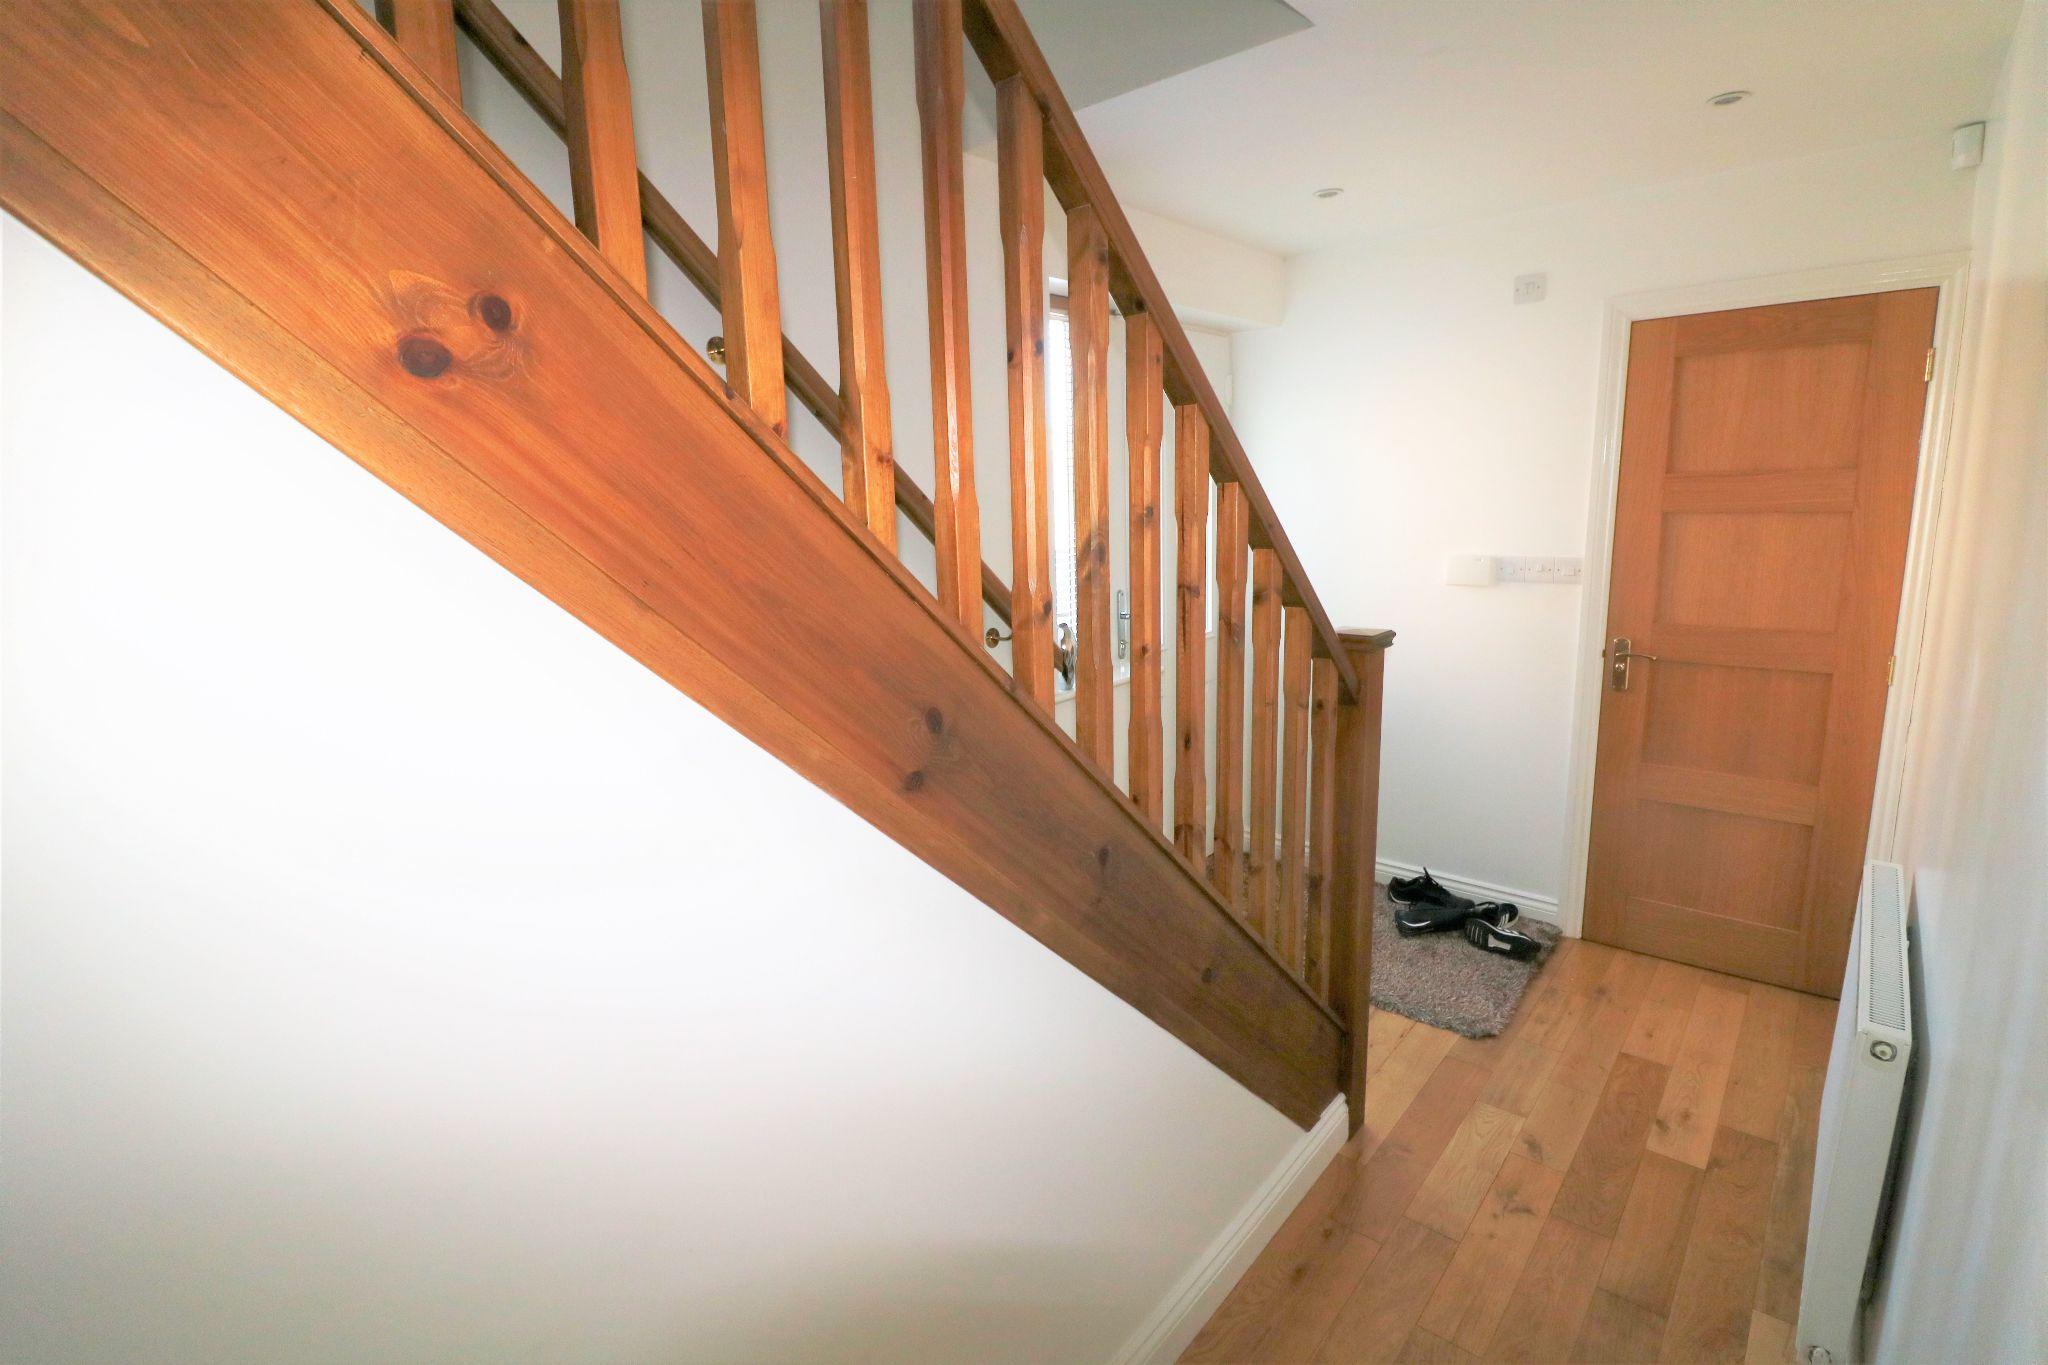 4 Bedroom Detached Dormer House For Sale - Photograph 6